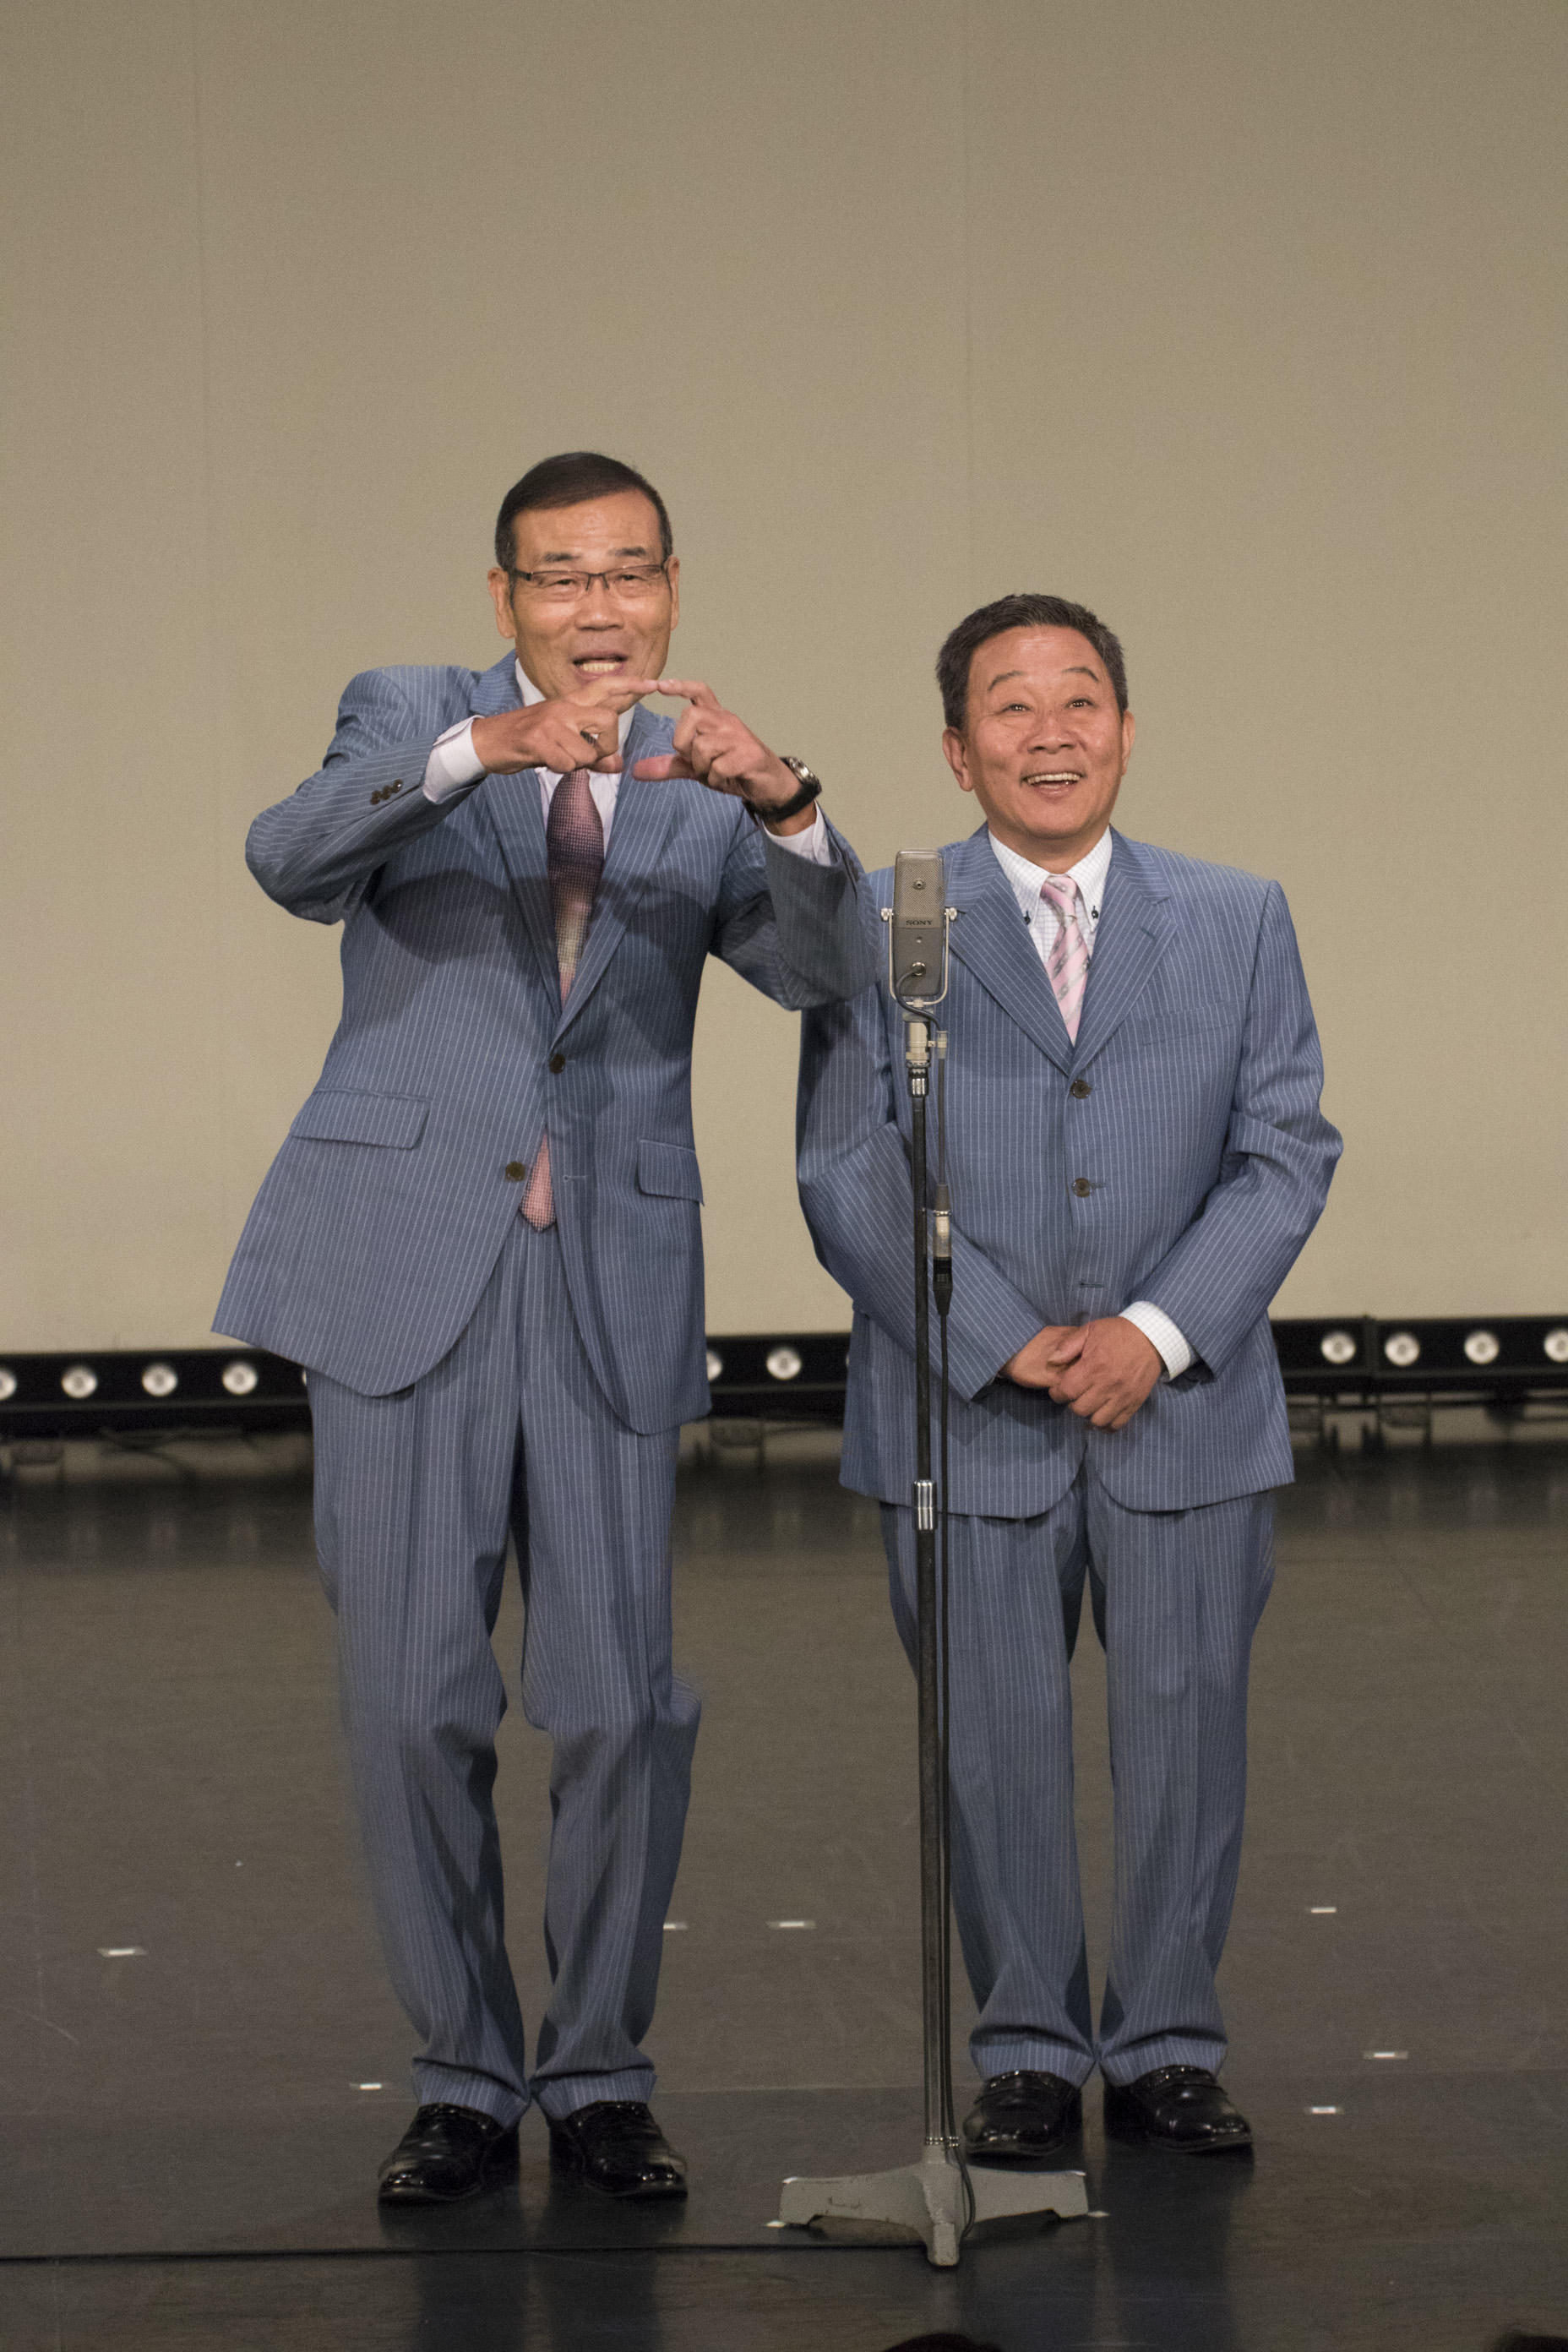 http://news.yoshimoto.co.jp/20170729092850-edd0d2013fd50b69f1a96db2d647f2655d32c186.jpg